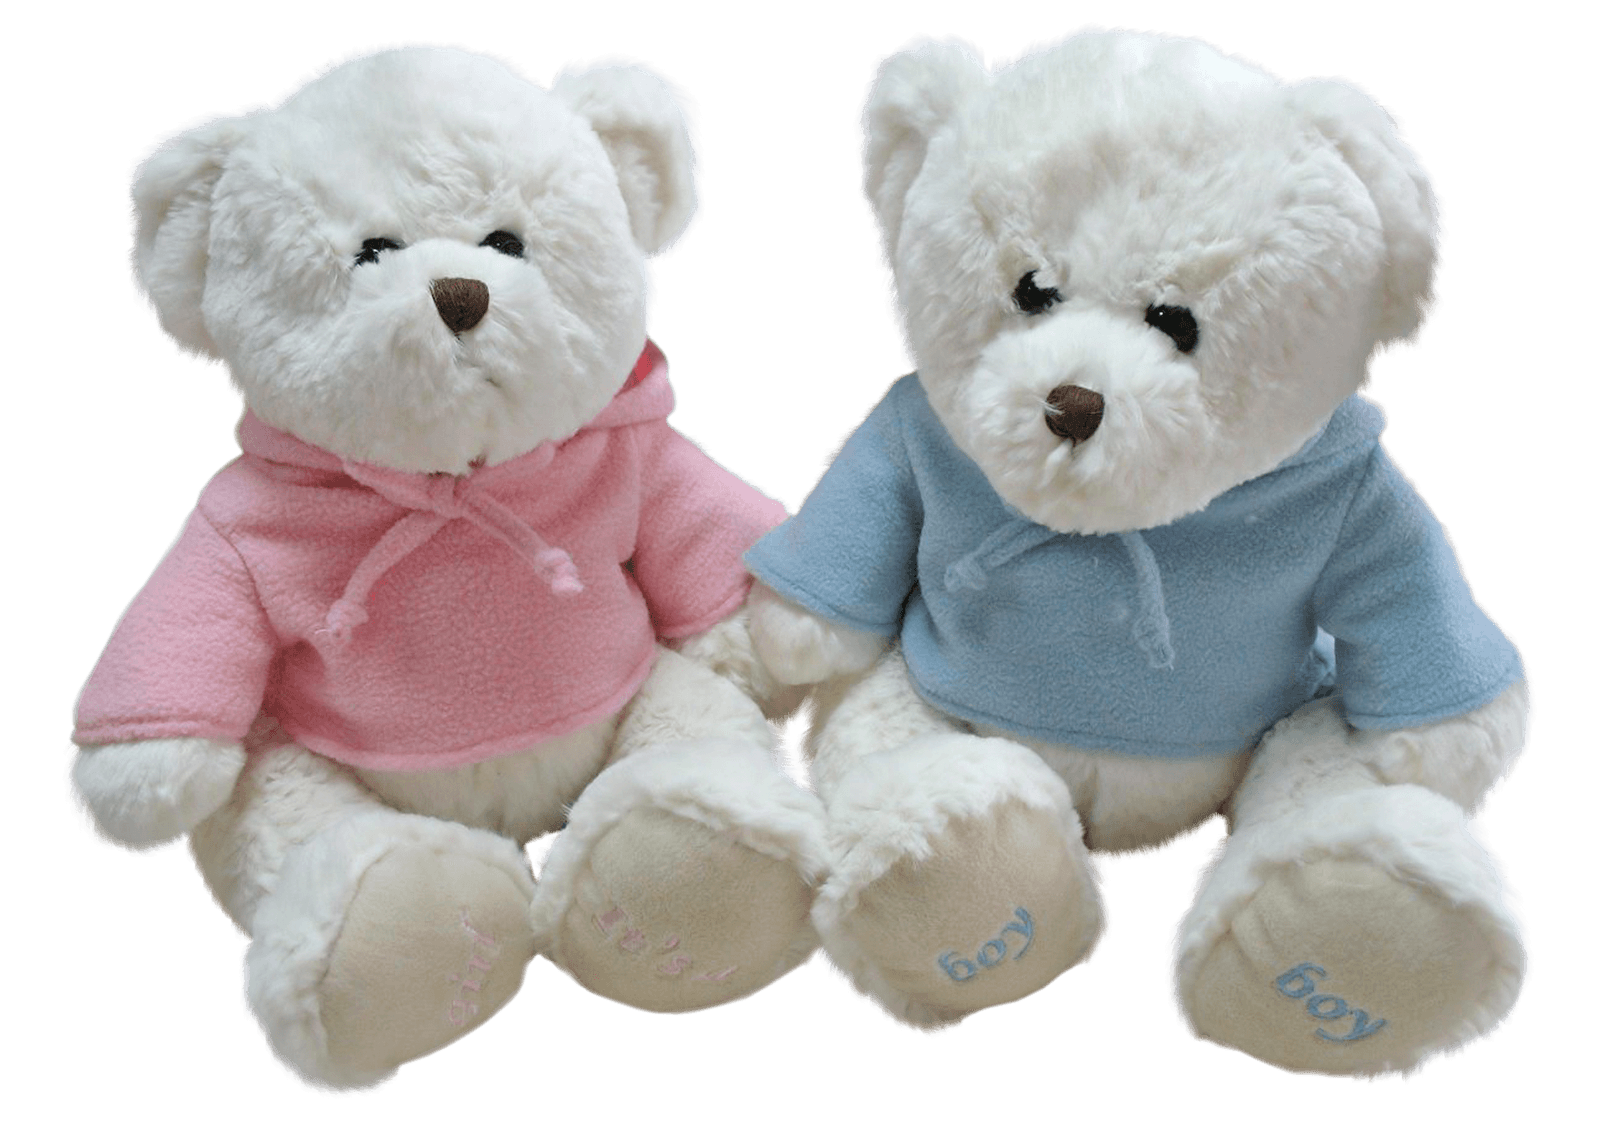 Patrones de osos de peluche | Pinterest | Patrones de osito de ...